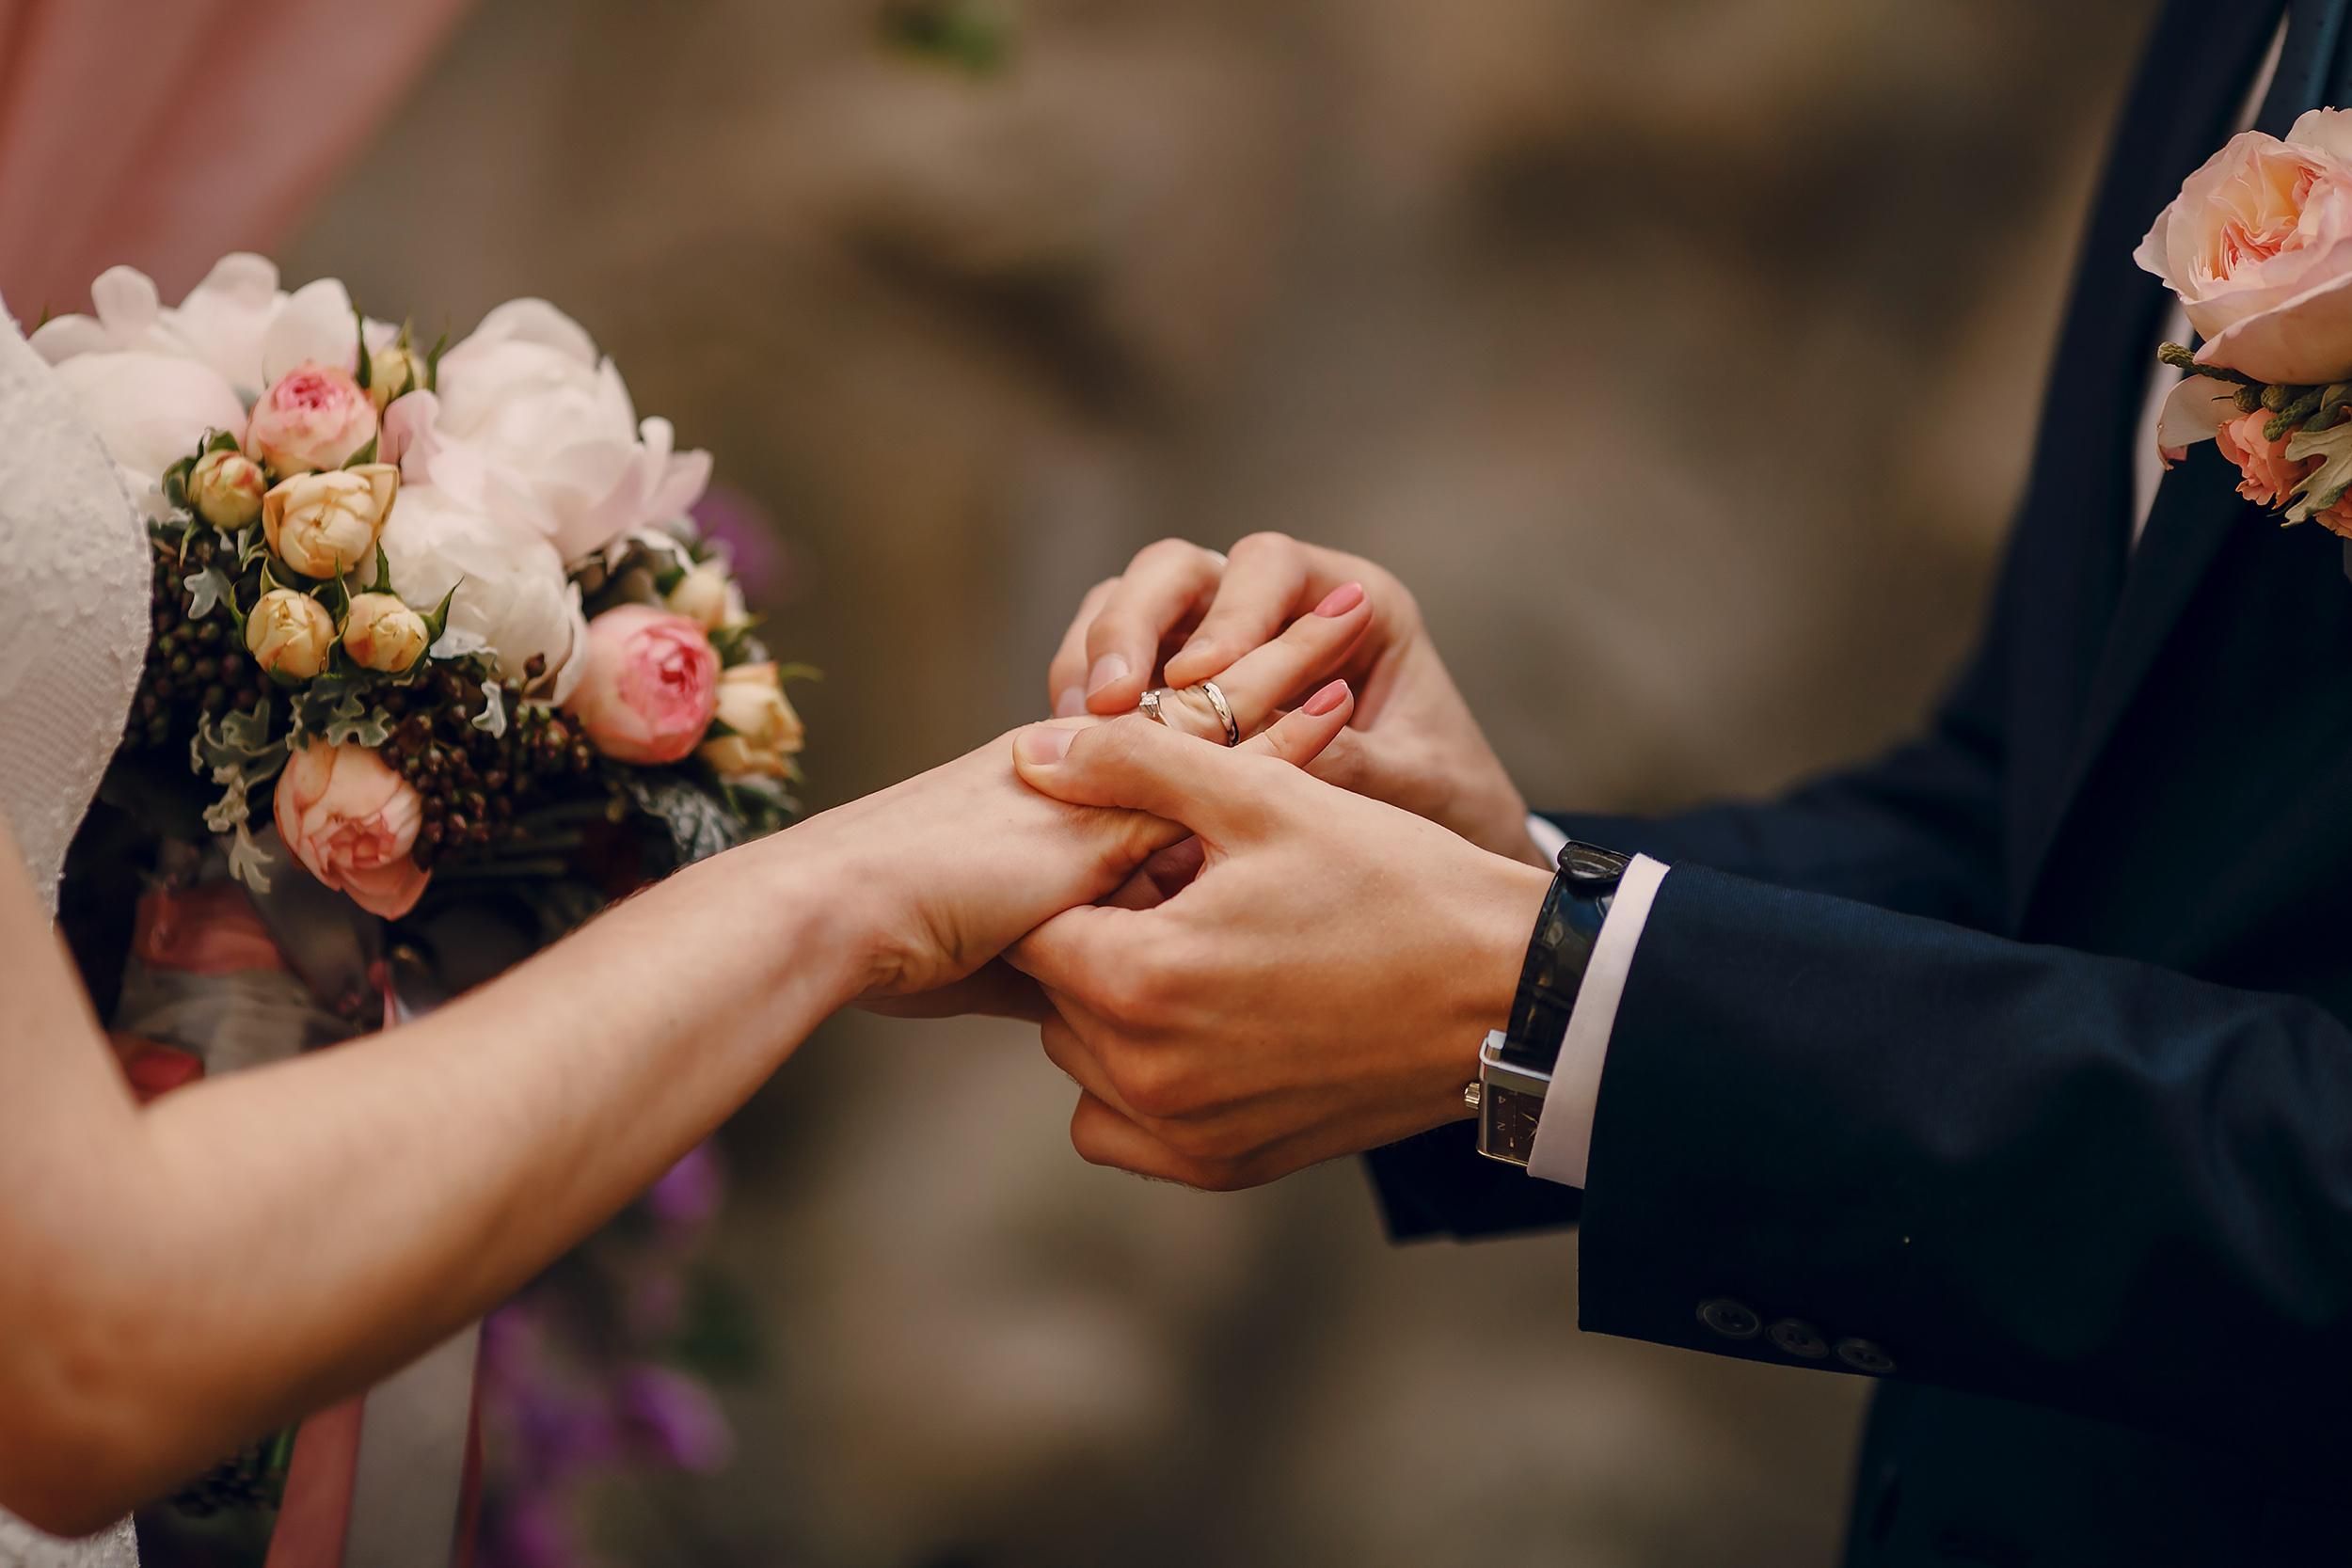 groom-putting-ring-bride-s-finger